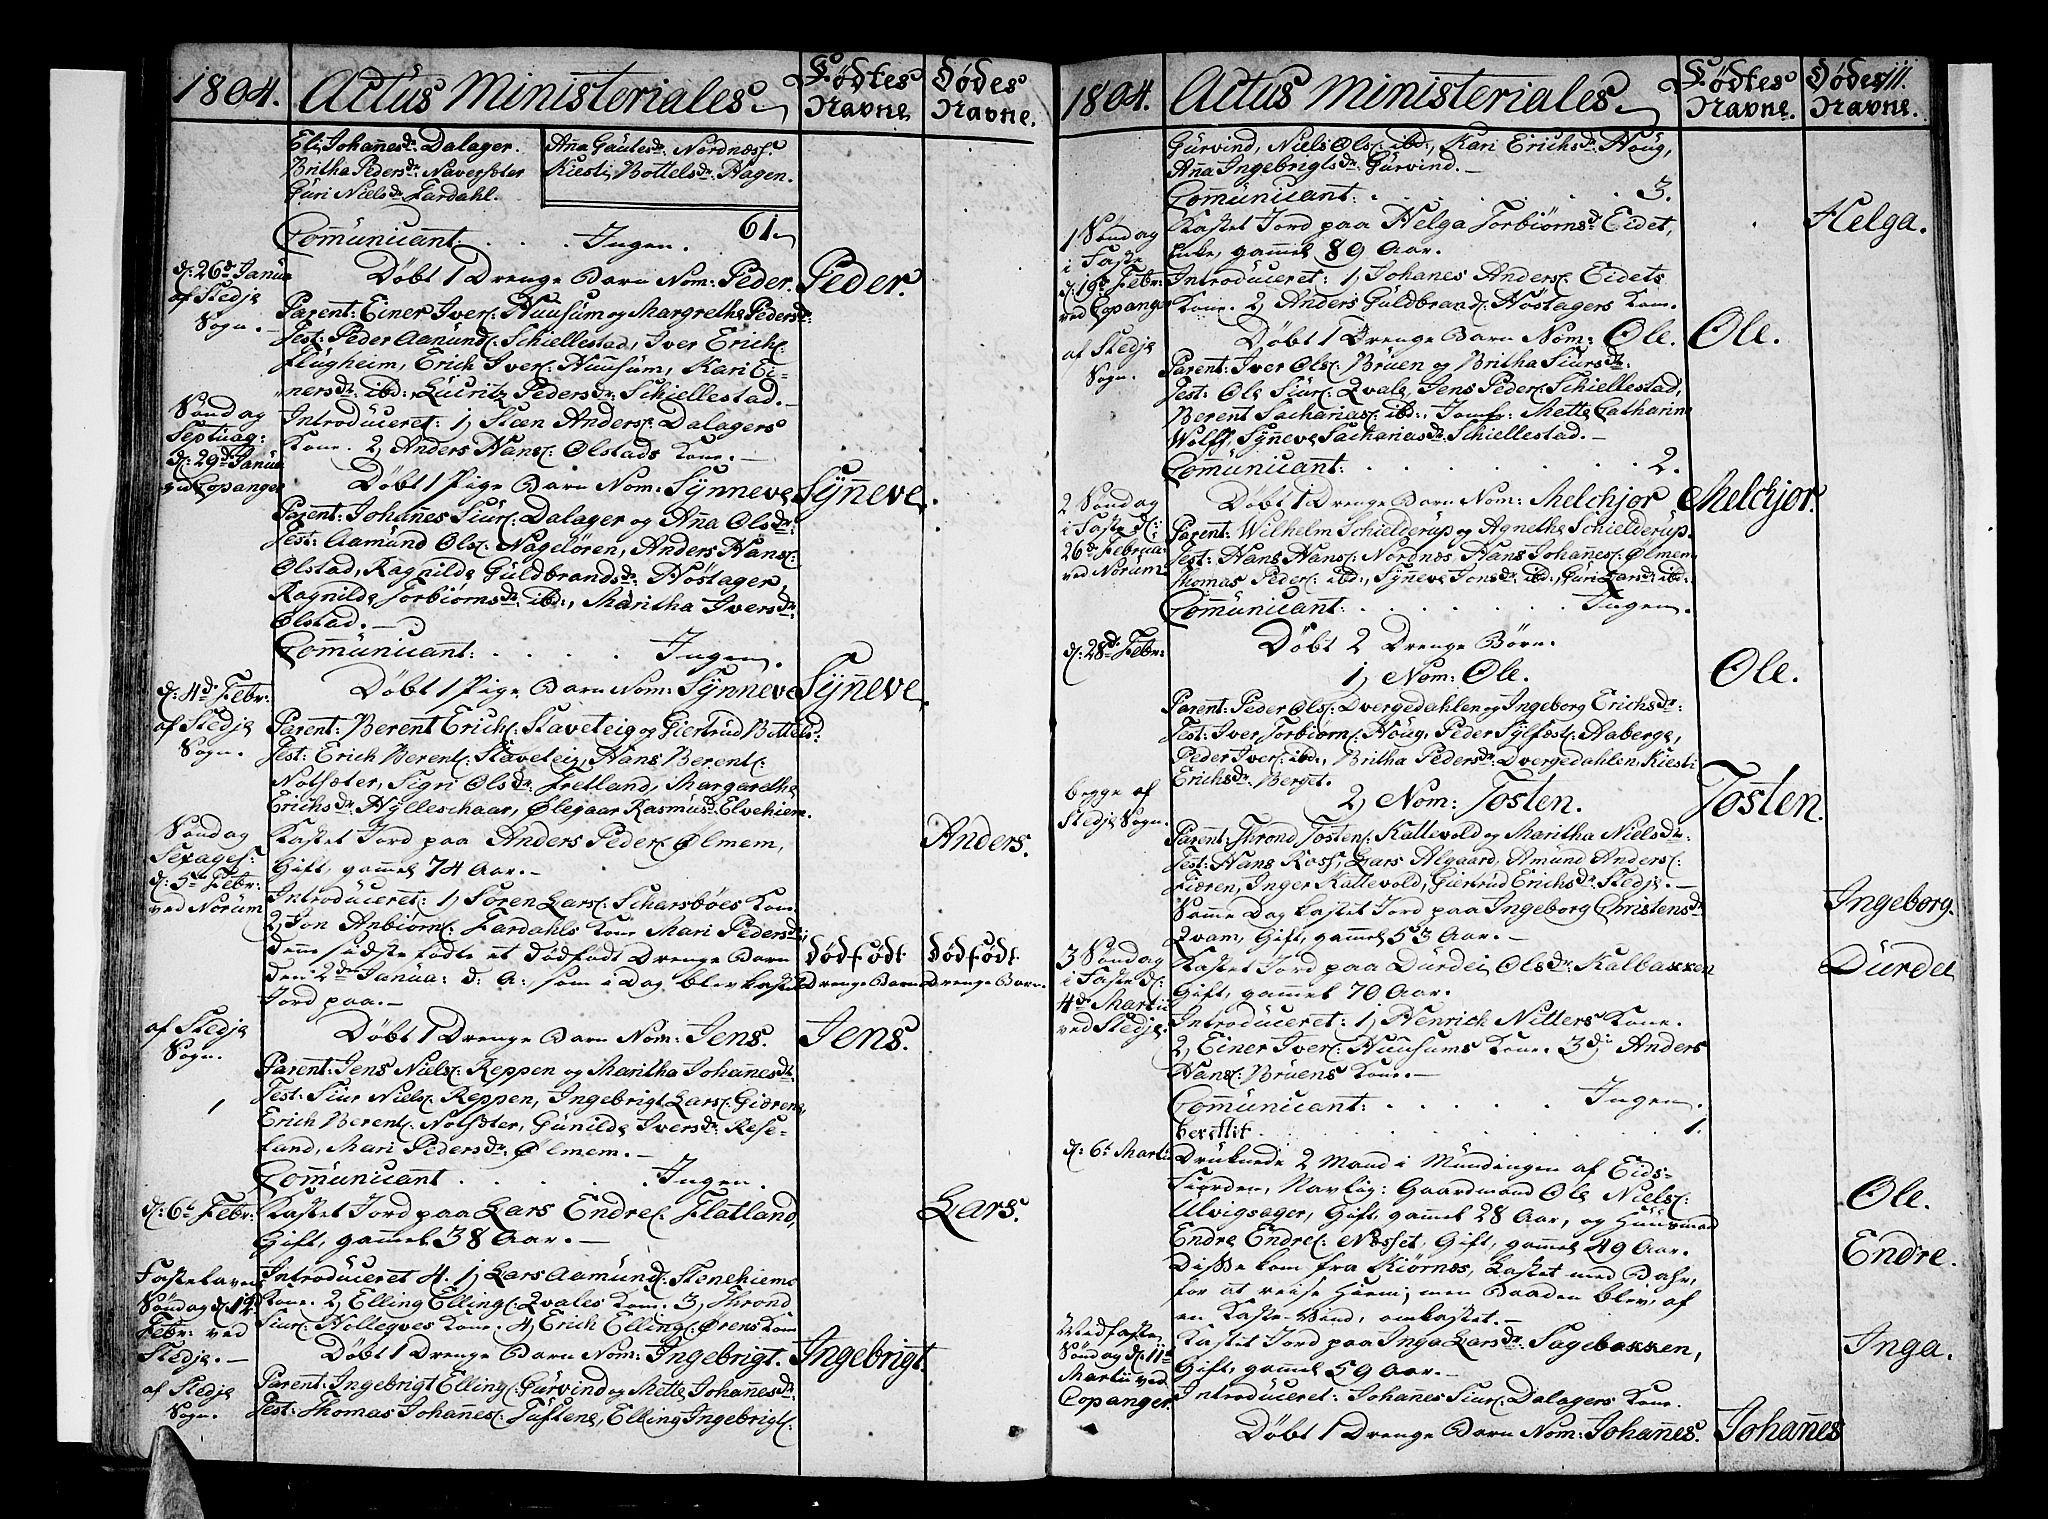 SAB, Sogndal sokneprestembete, H/Haa/Haaa/L0008: Ministerialbok nr. A 8, 1795-1809, s. 111